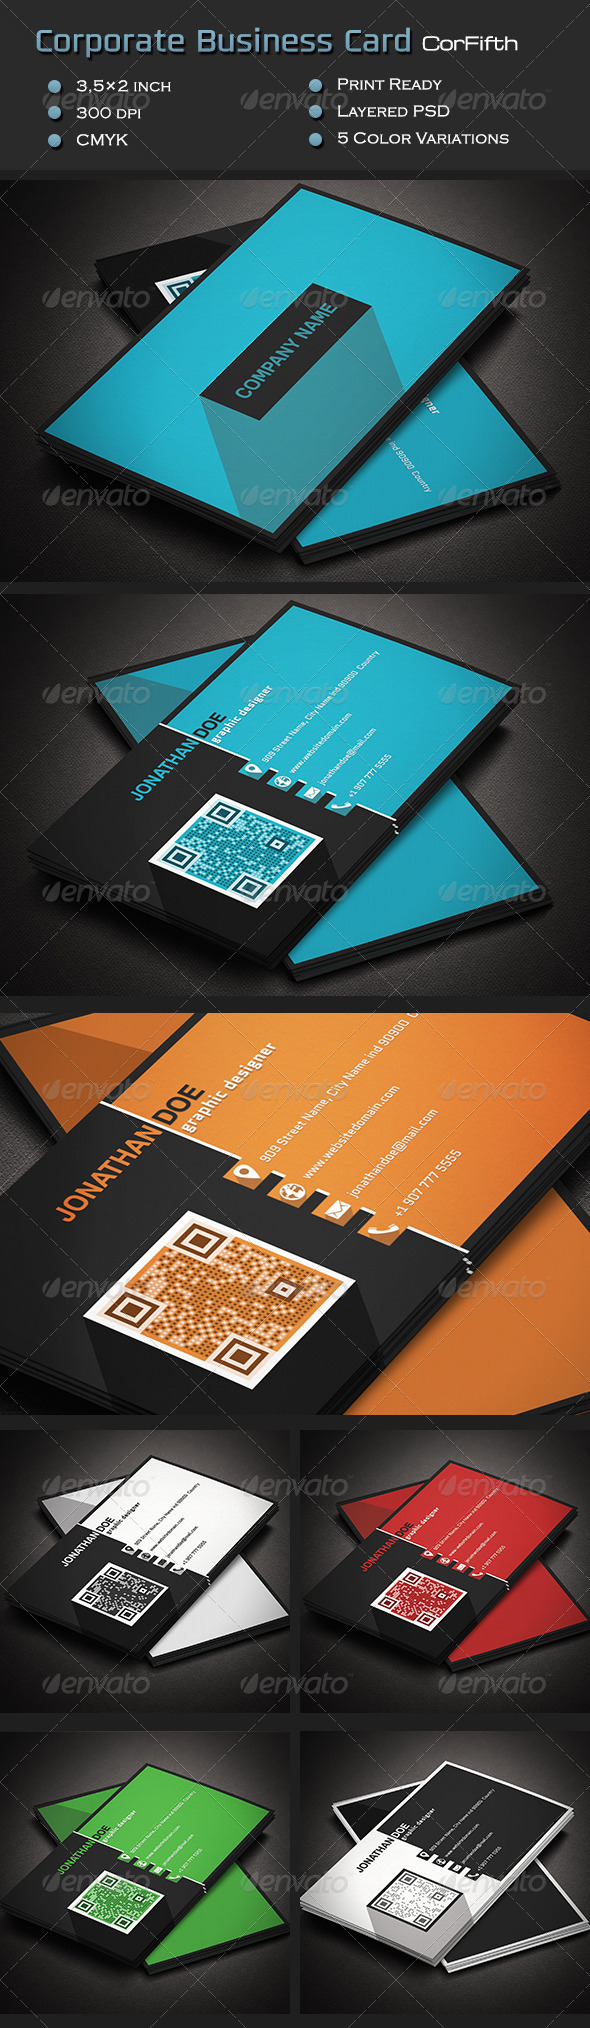 Corporate Business Card CorFifth - Corporate Business Cards